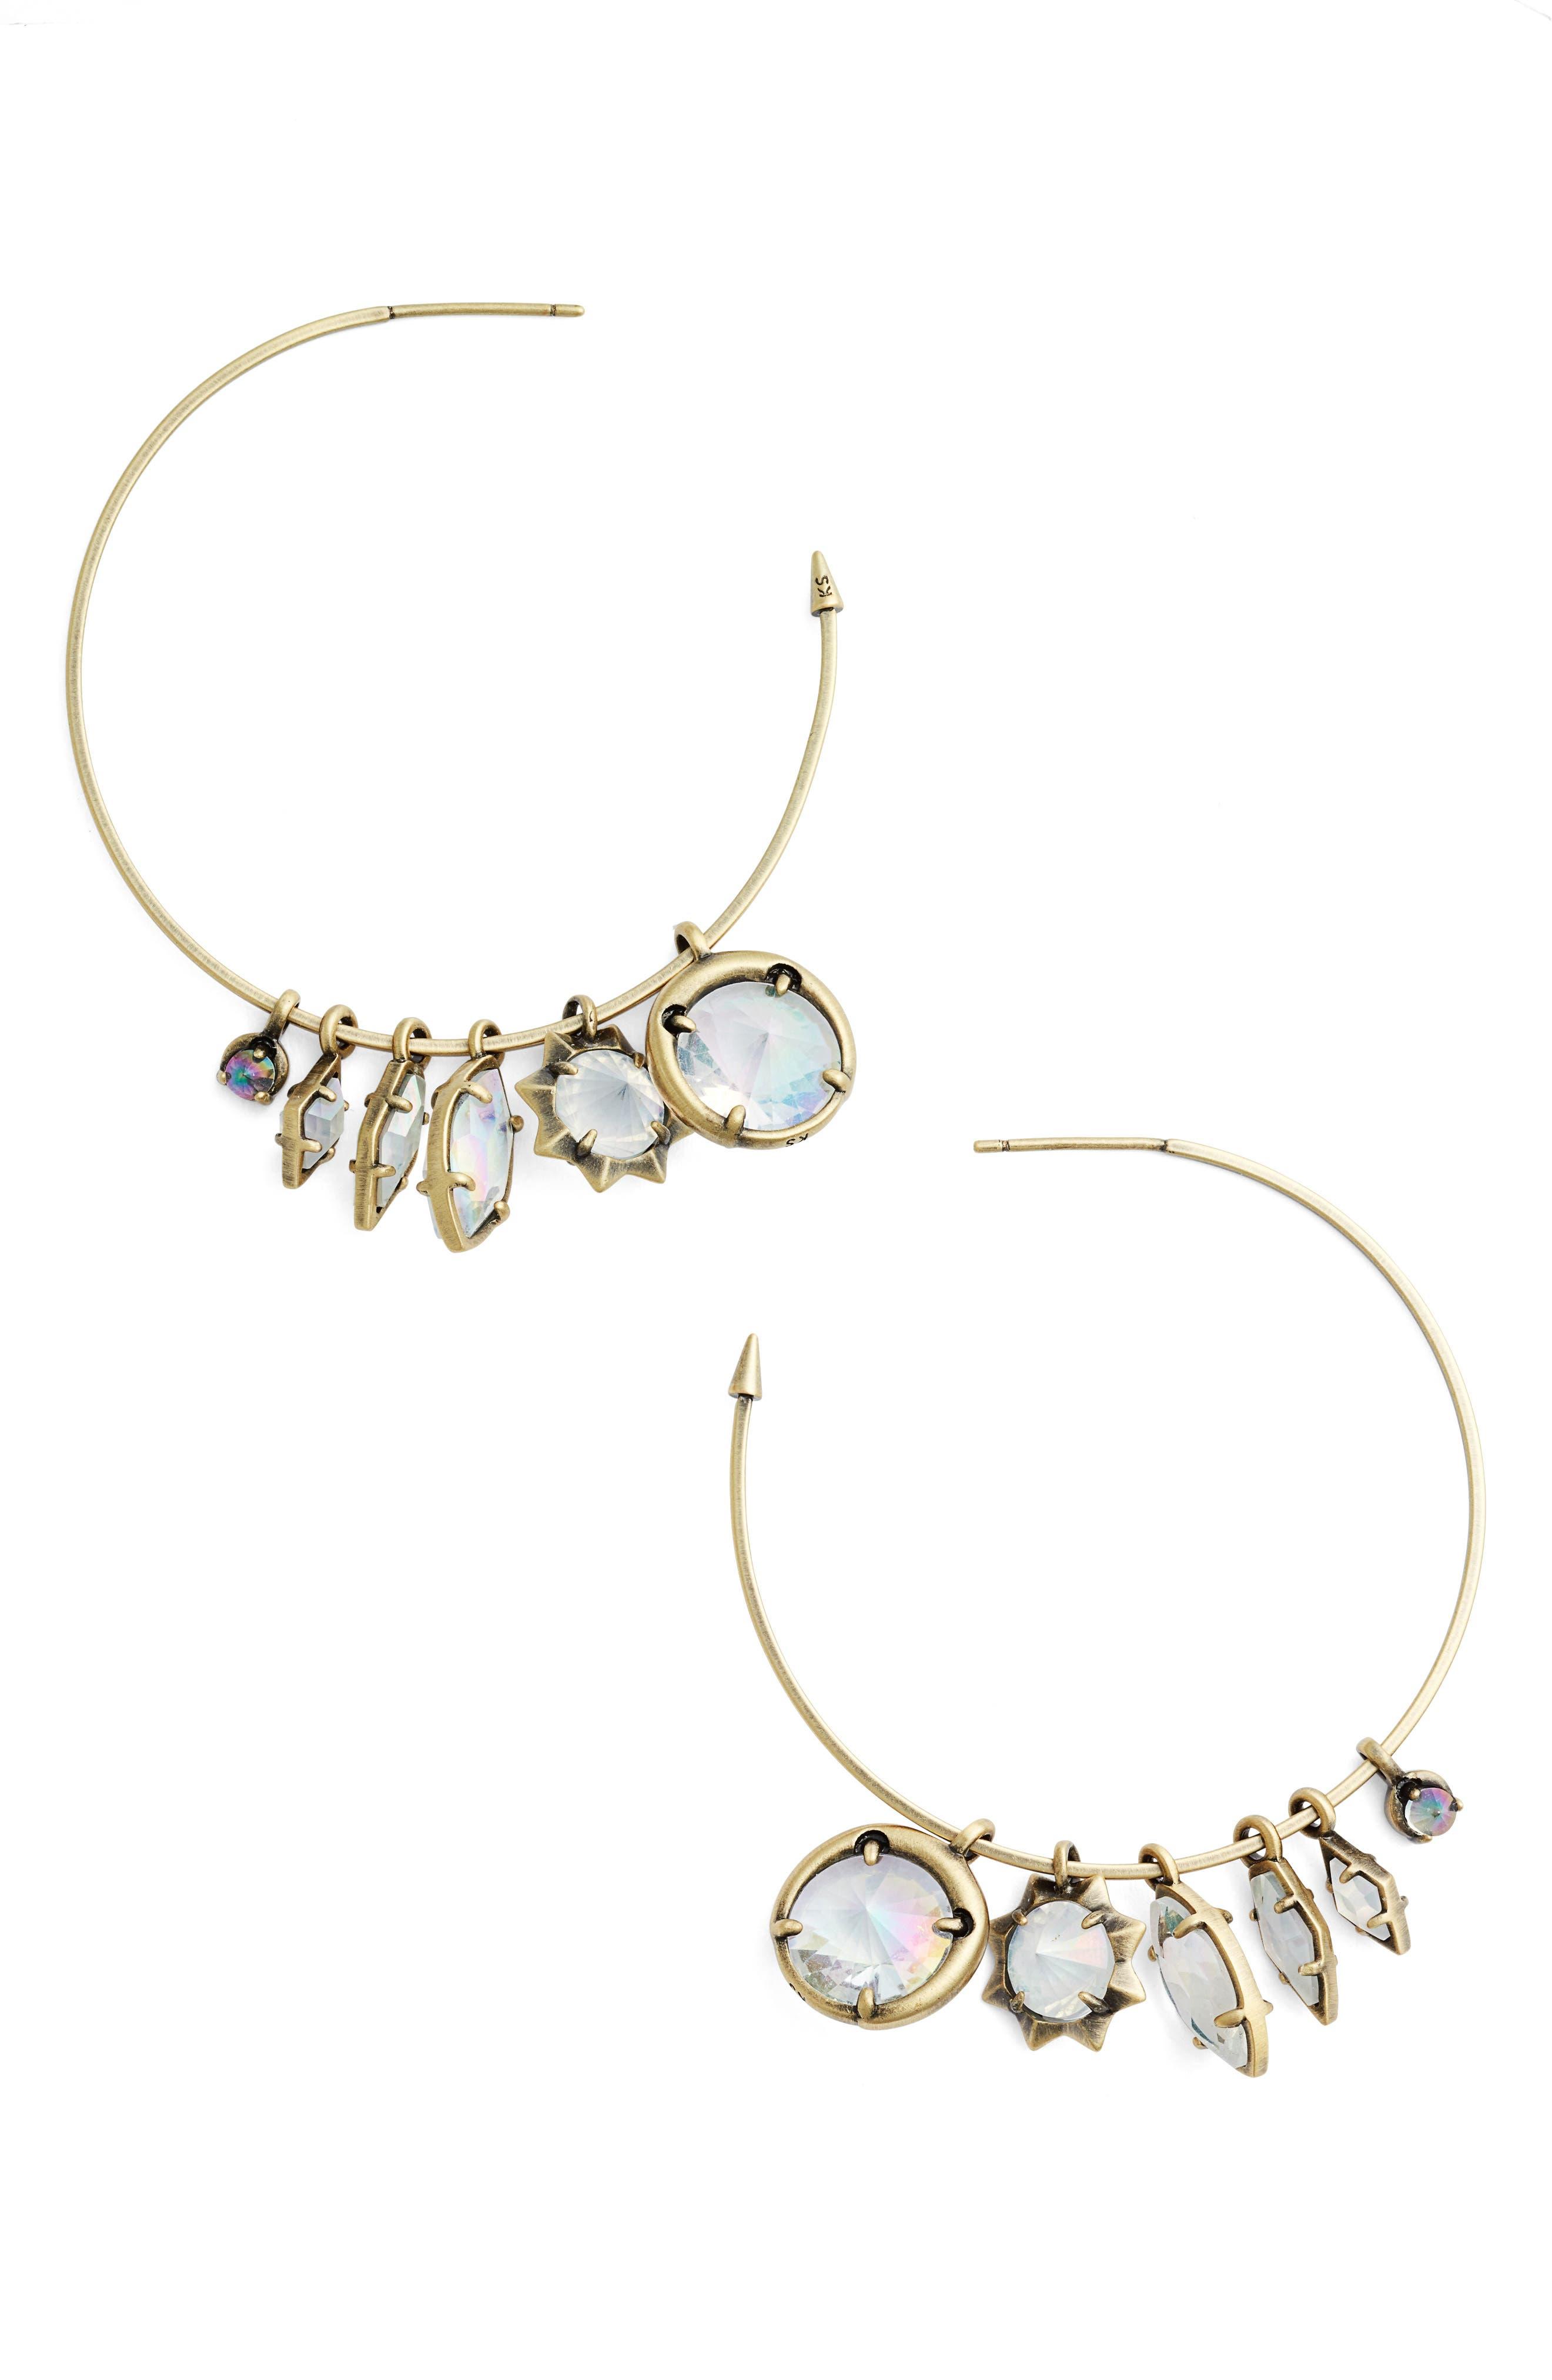 Main Image - Kendra Scott Alyssa Hoop Earrings